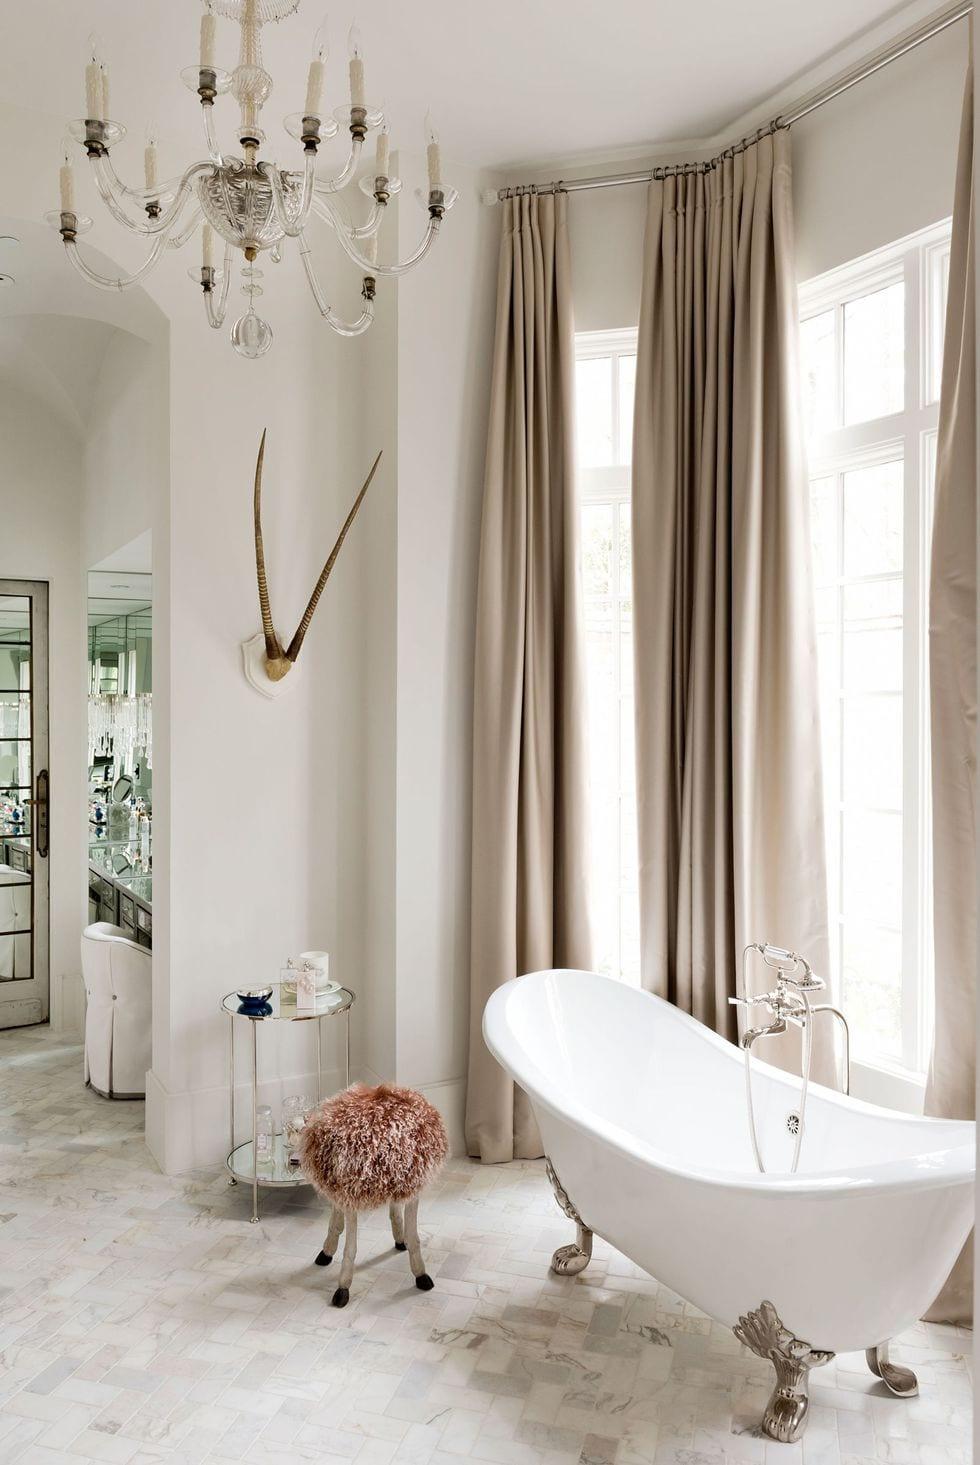 Boho style bathtub design ideas